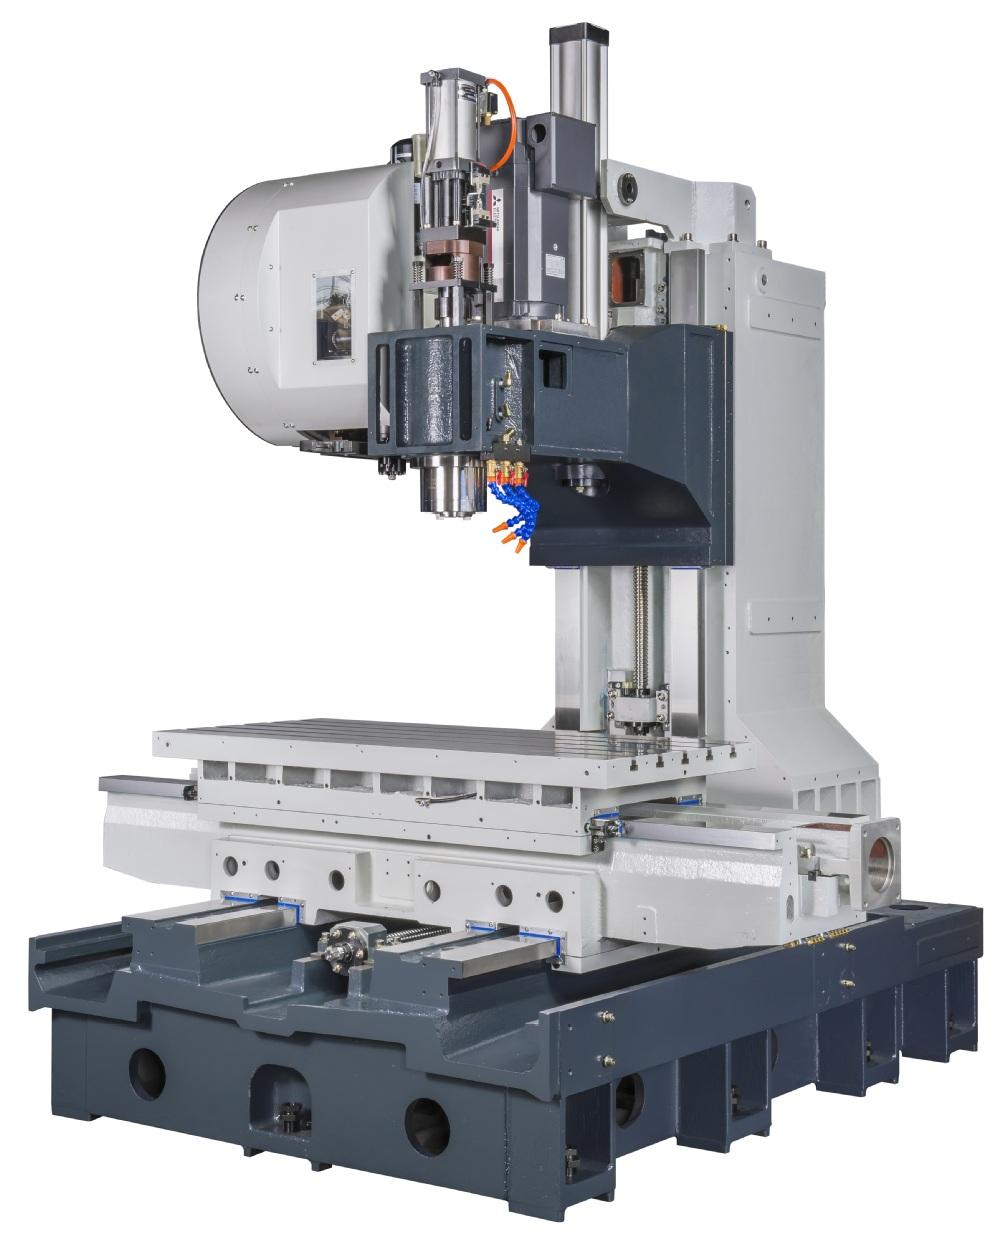 NVM-1166 Taiwan CNC Milling Machine